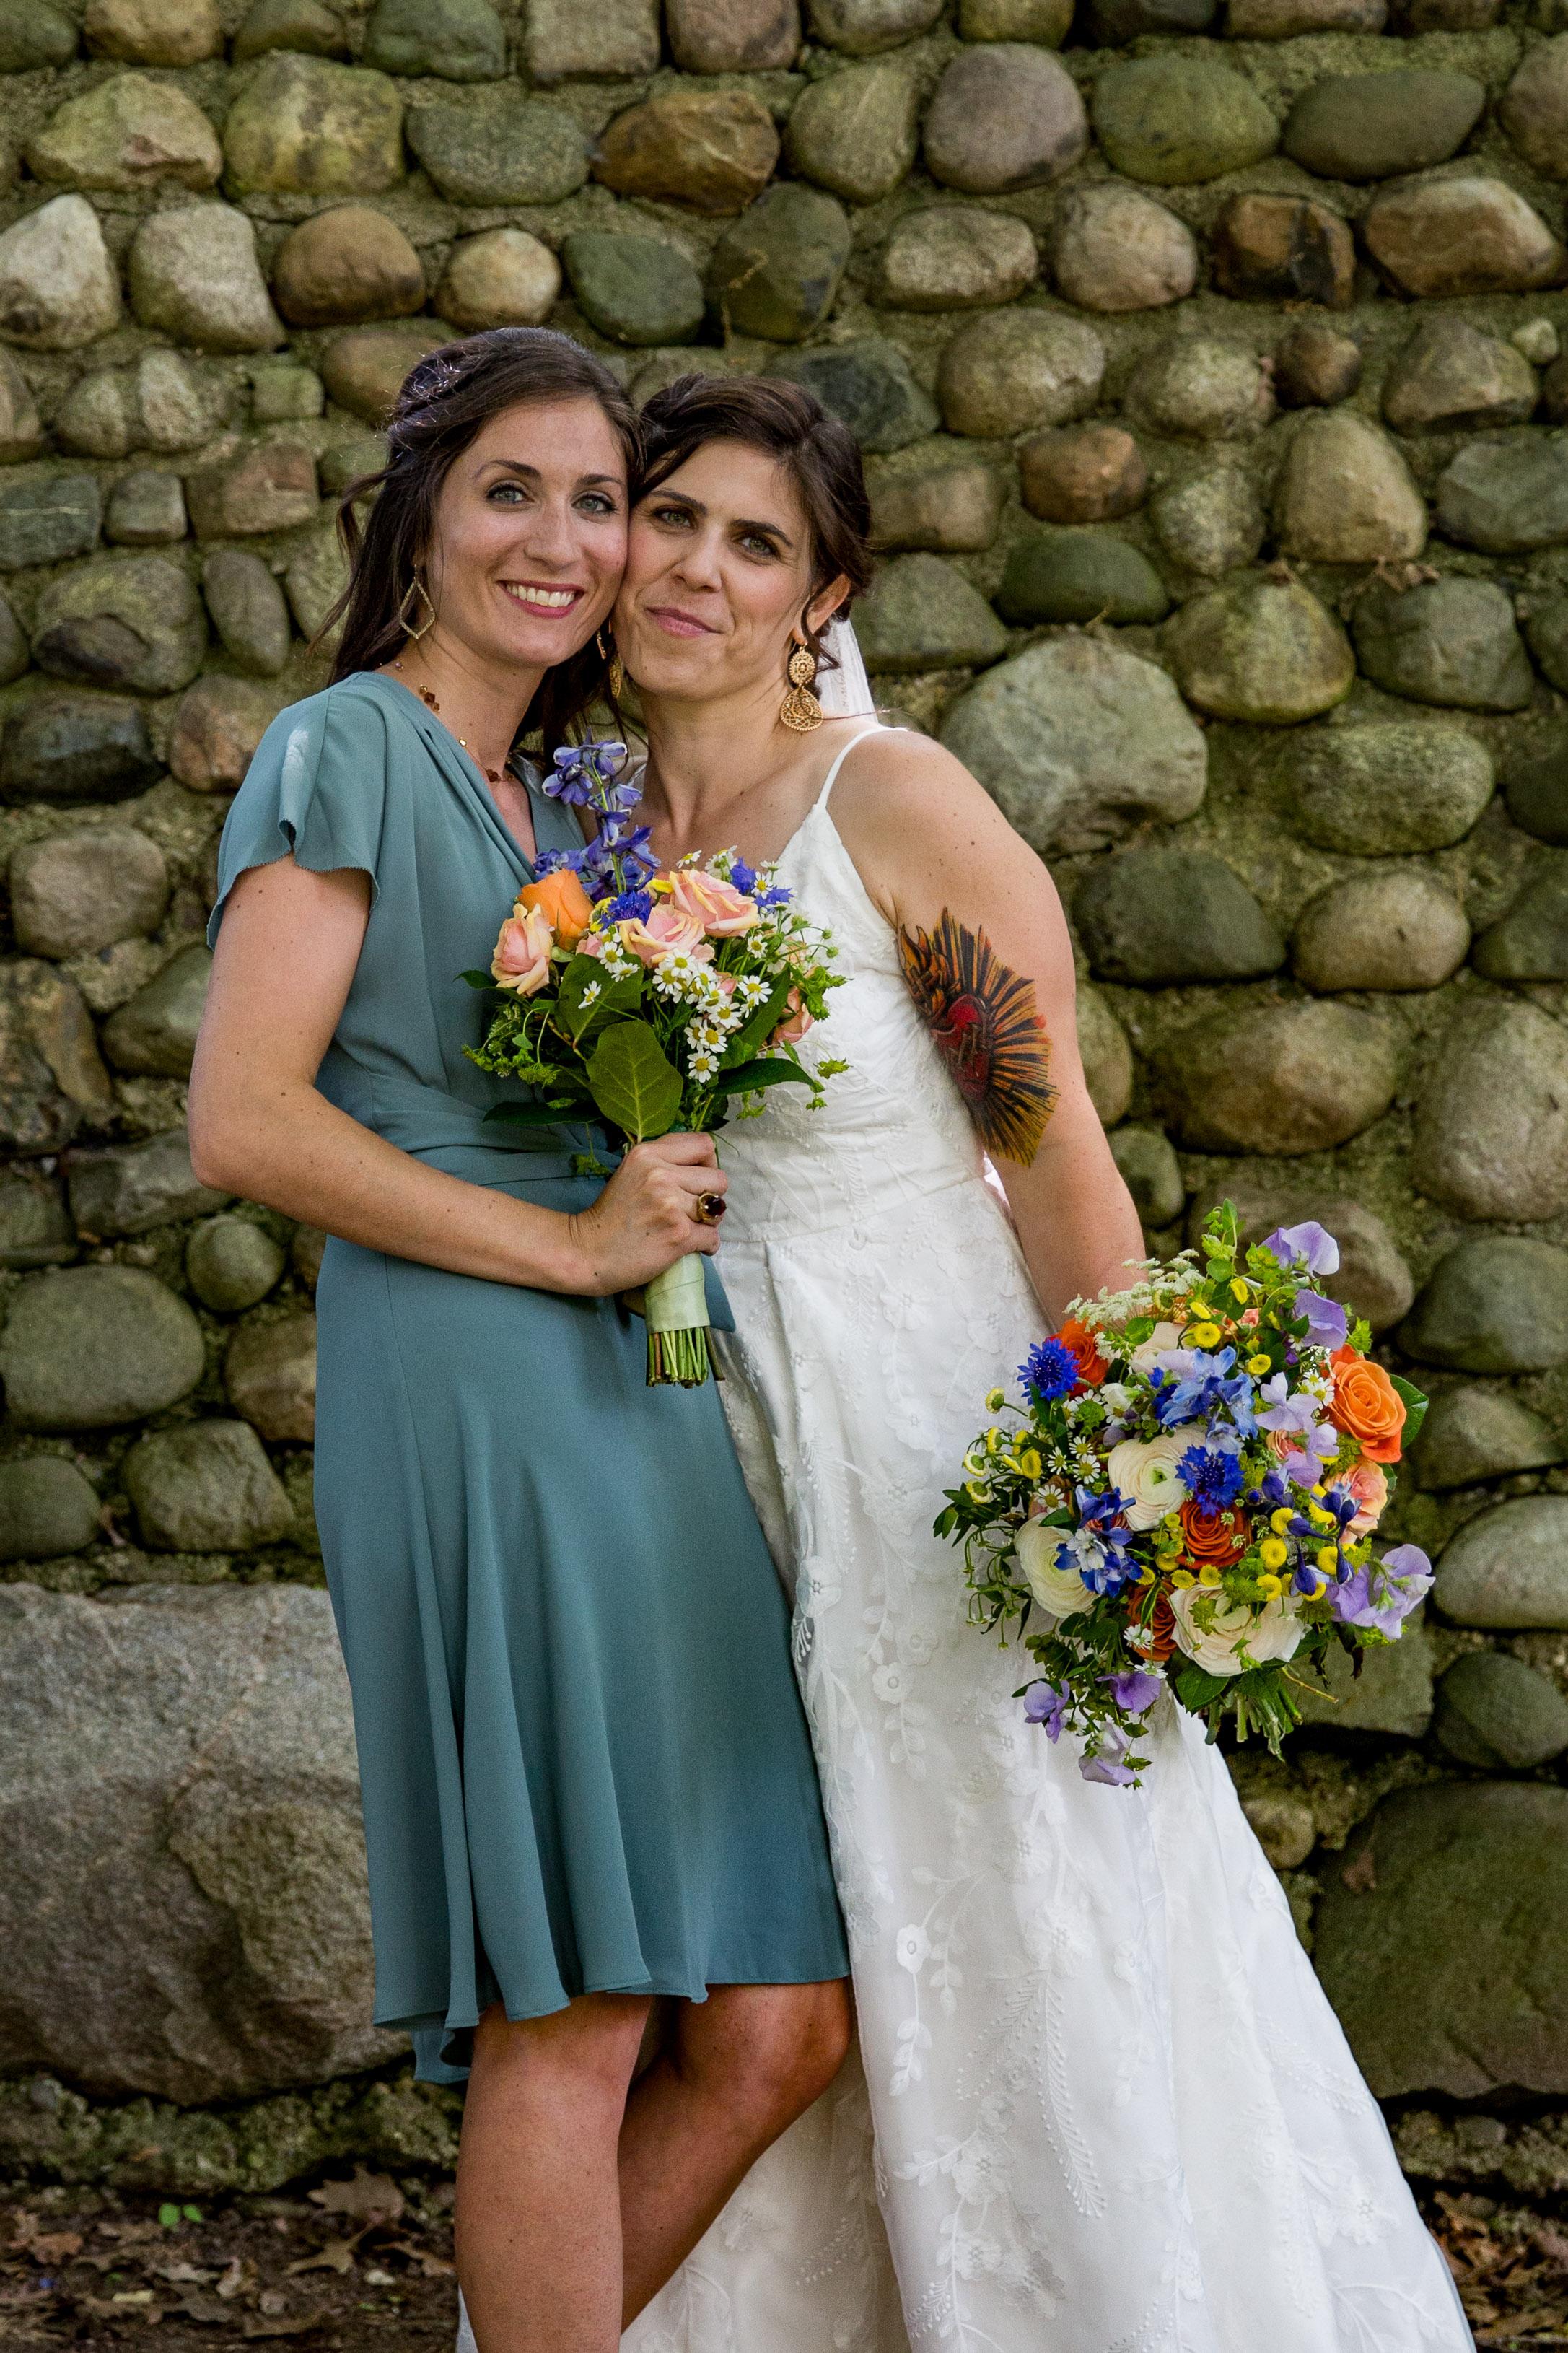 Natalie and Dallas Mooney Wedding 6-8-19_Tania Watt Photography-341.jpg